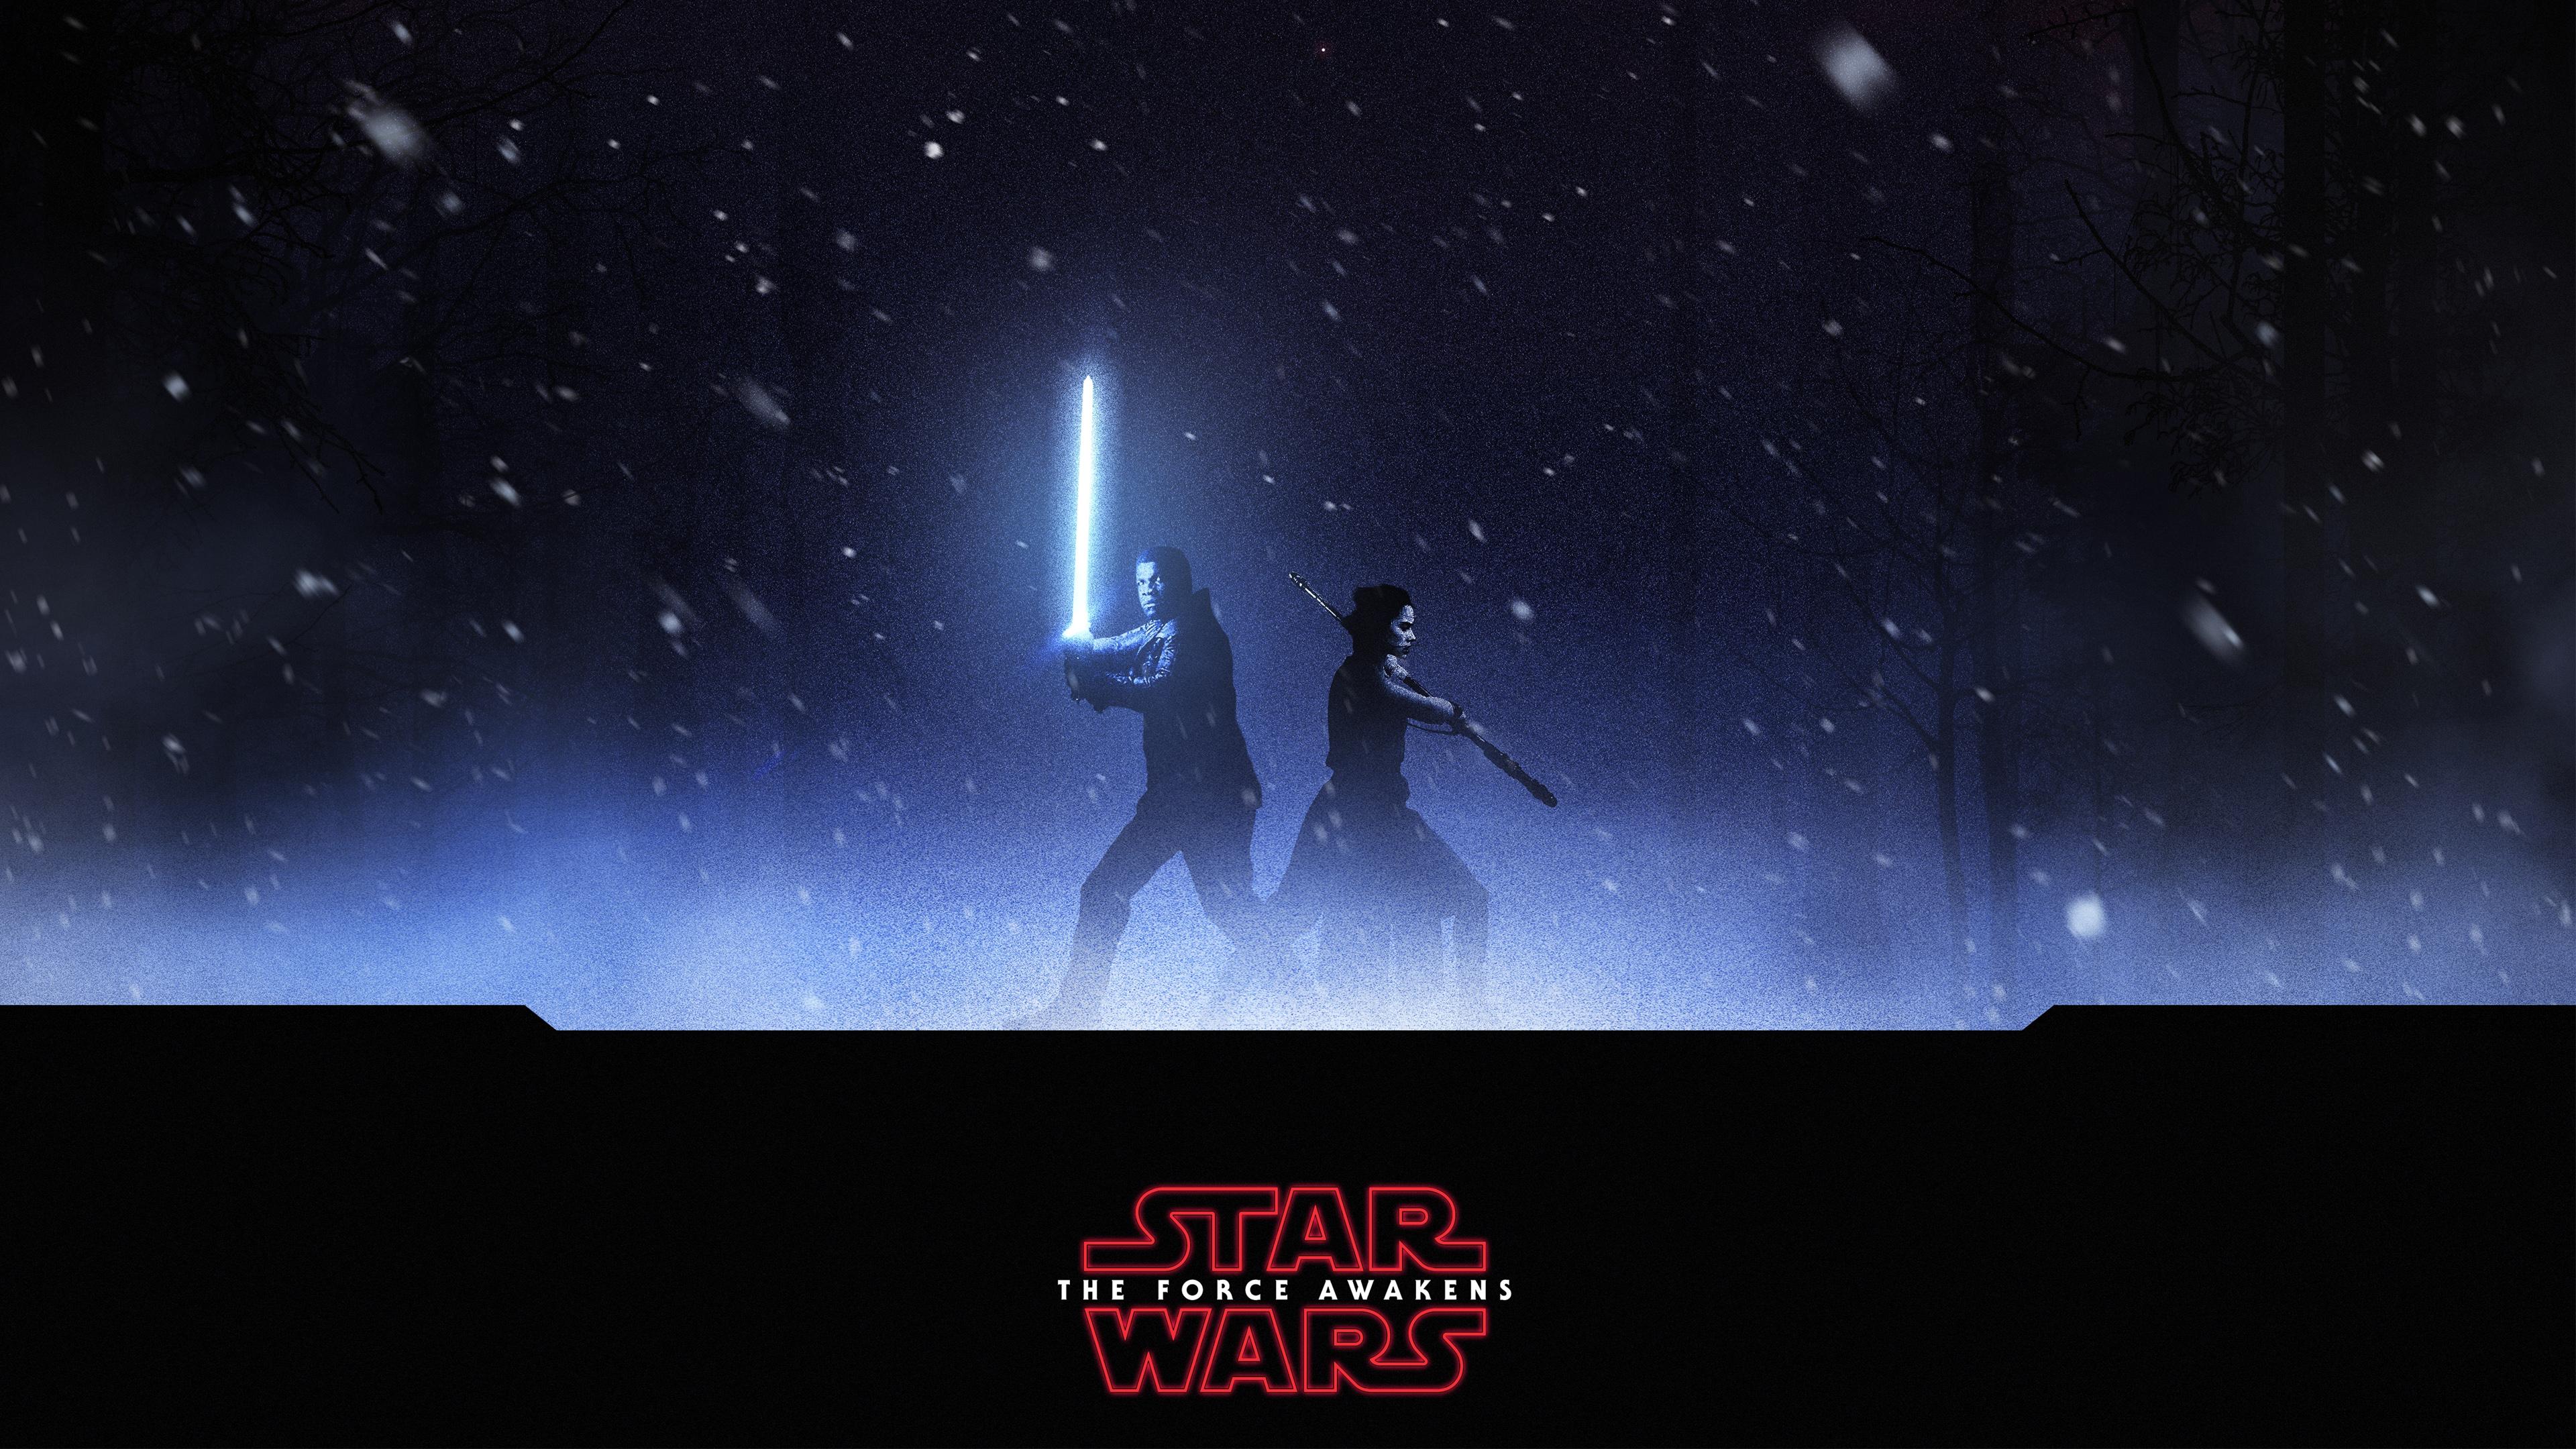 Finn rey star wars hd movies 4k wallpapers images - 4k star wars wallpaper ...